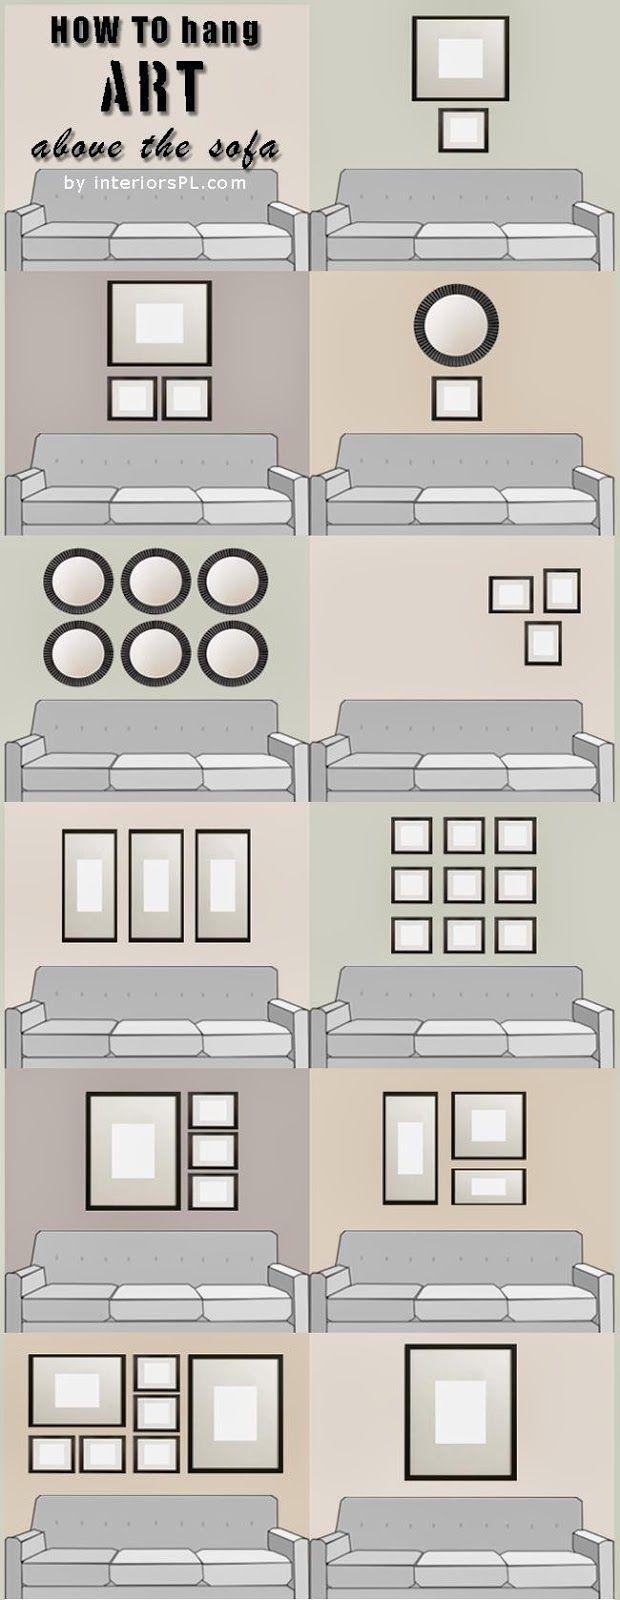 01-4.jpg 620×1,600 pixels